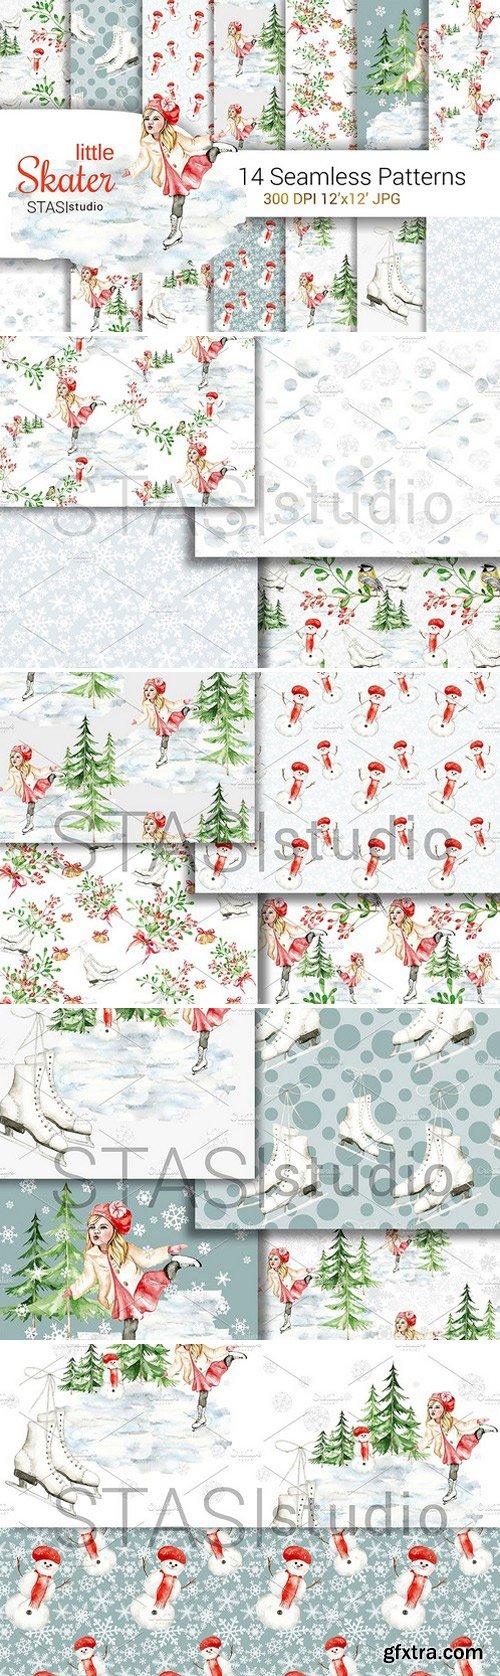 CM - Christmas Digital Paper Pack 1890105